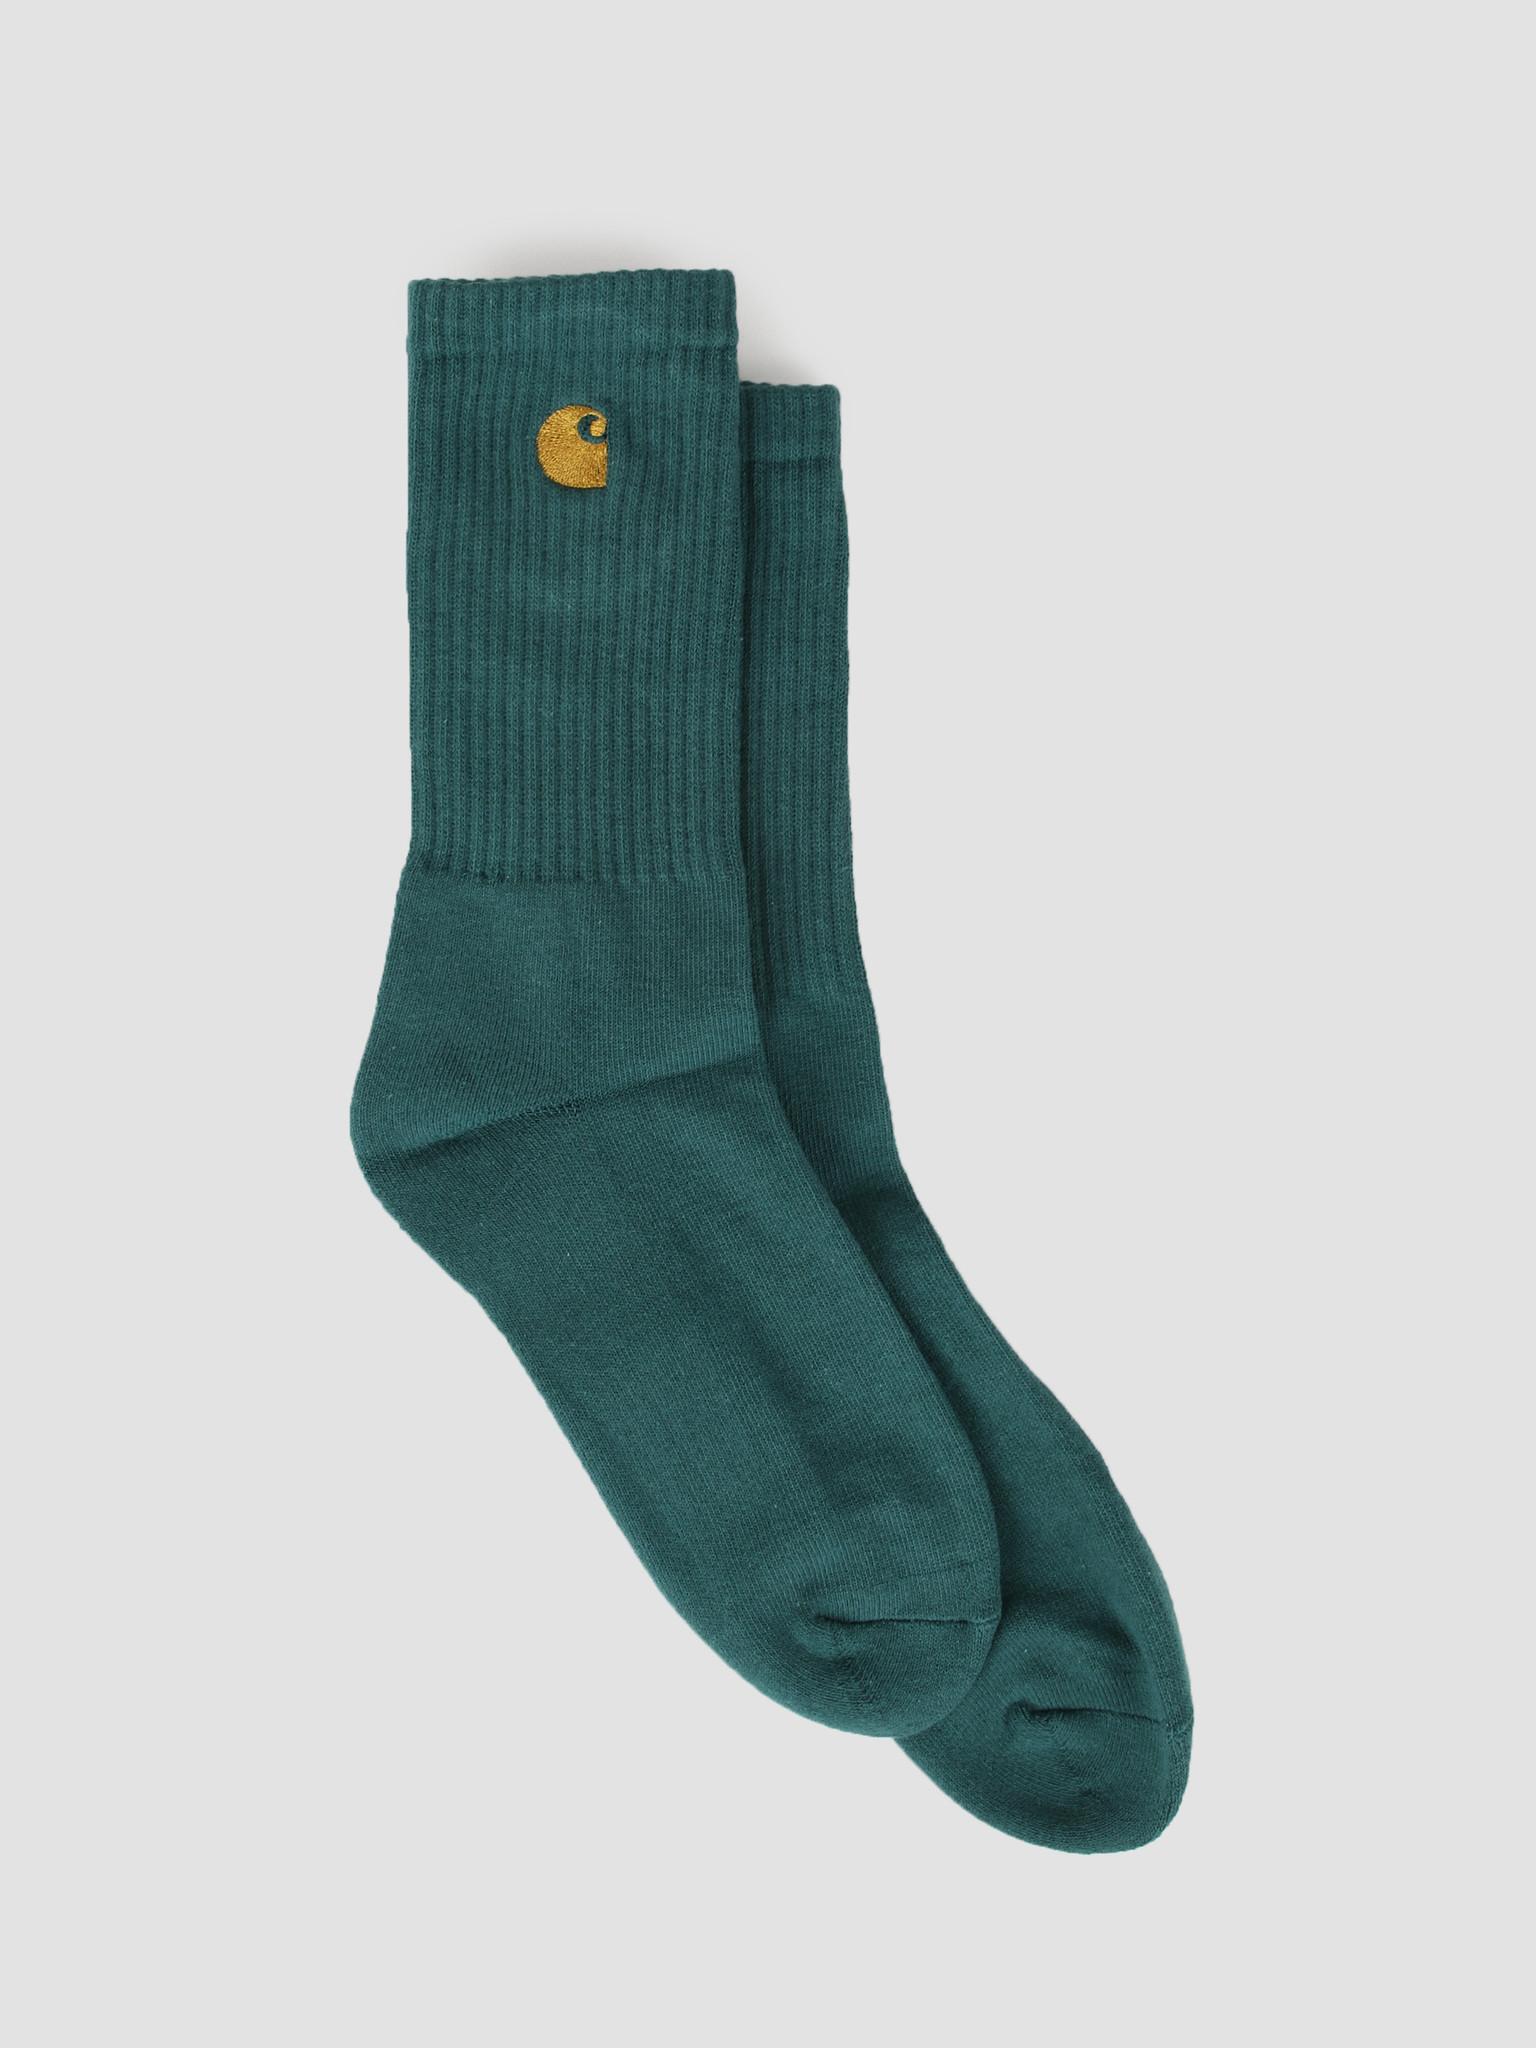 Carhartt WIP Carhartt WIP Chase Socks Dark Fir Gold I026527